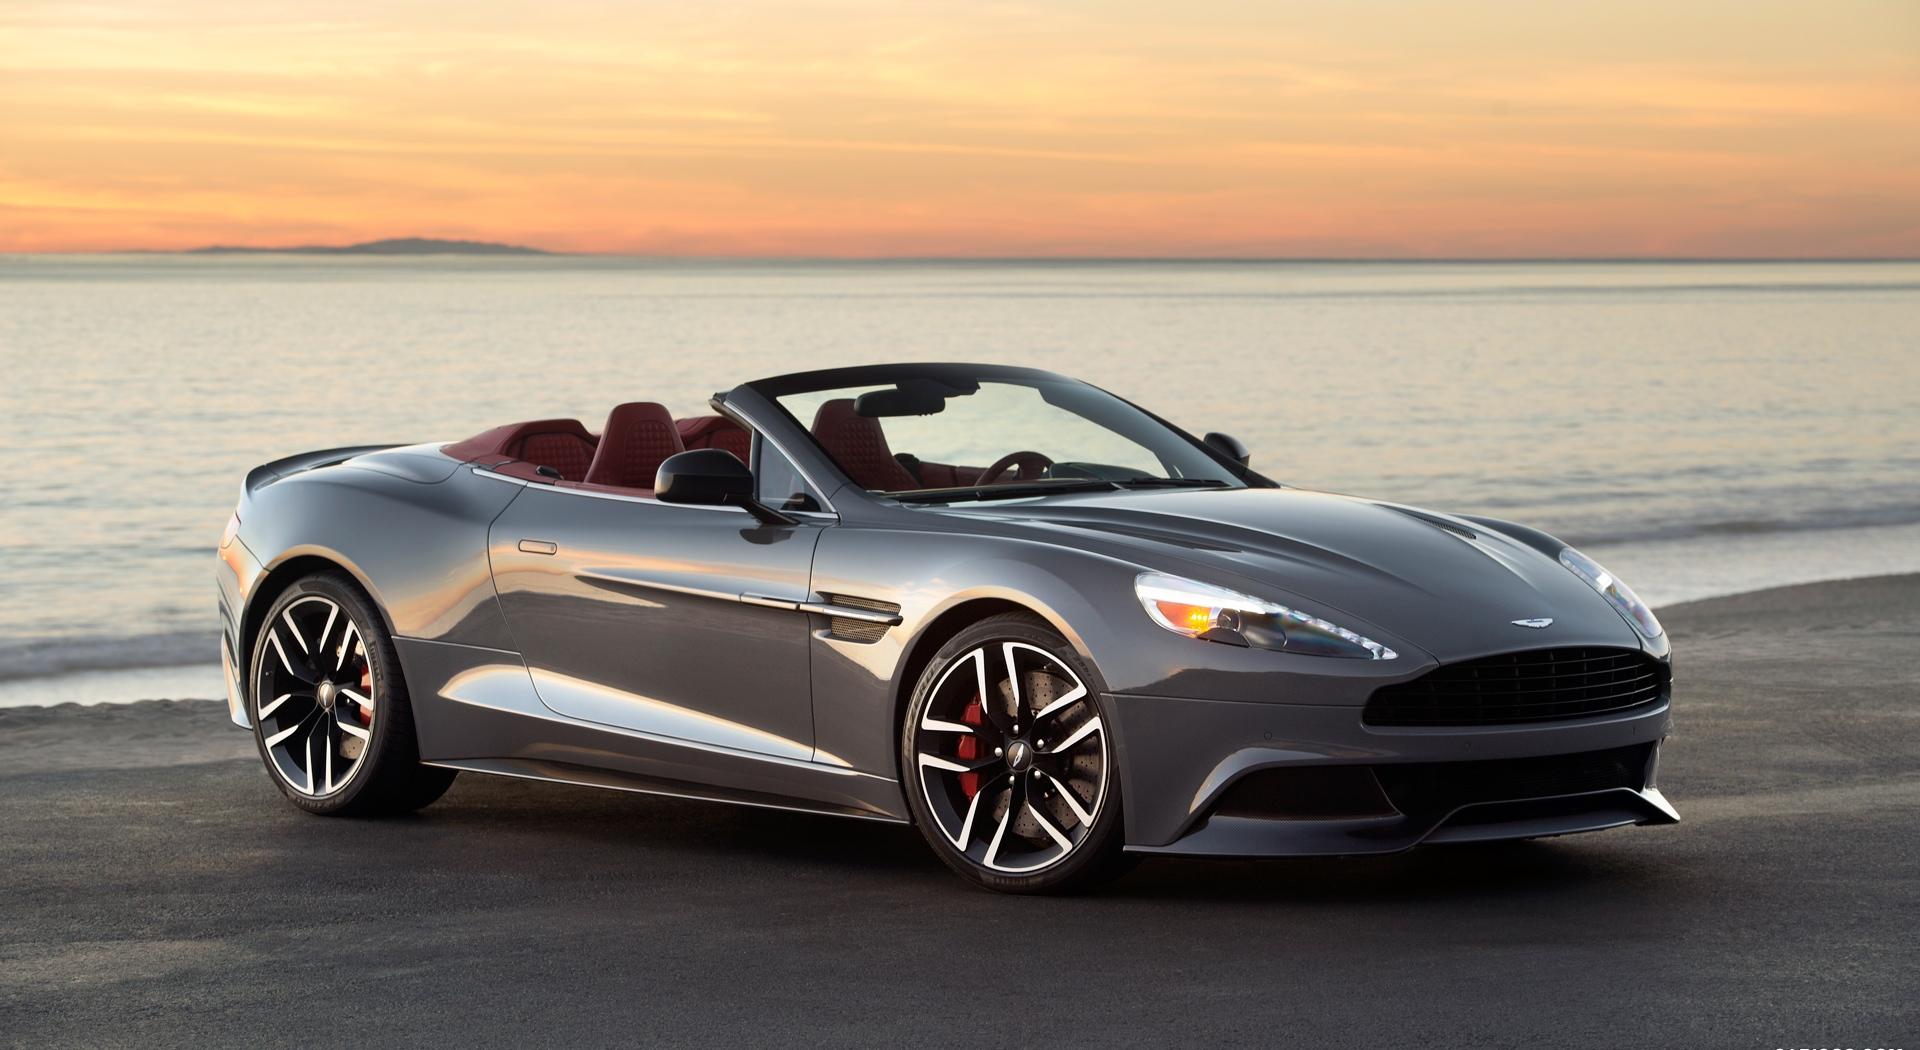 Aston Martin Vanquish volante A2